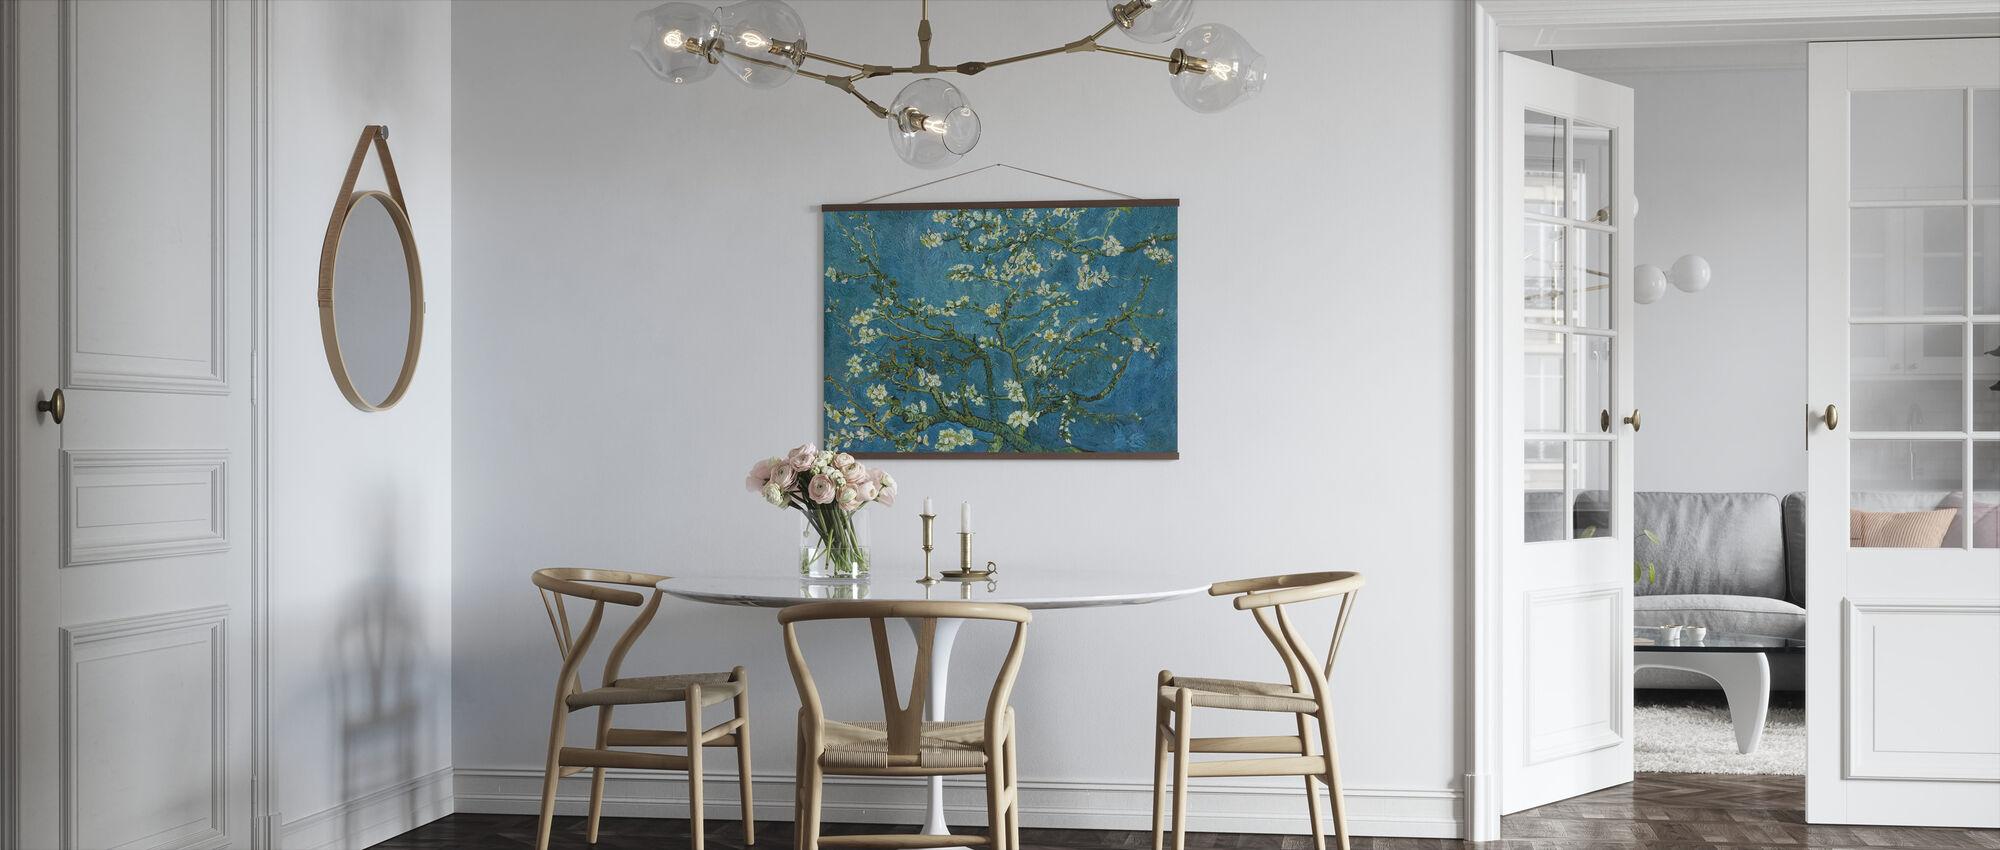 Amandelbloesem - Poster - Keuken